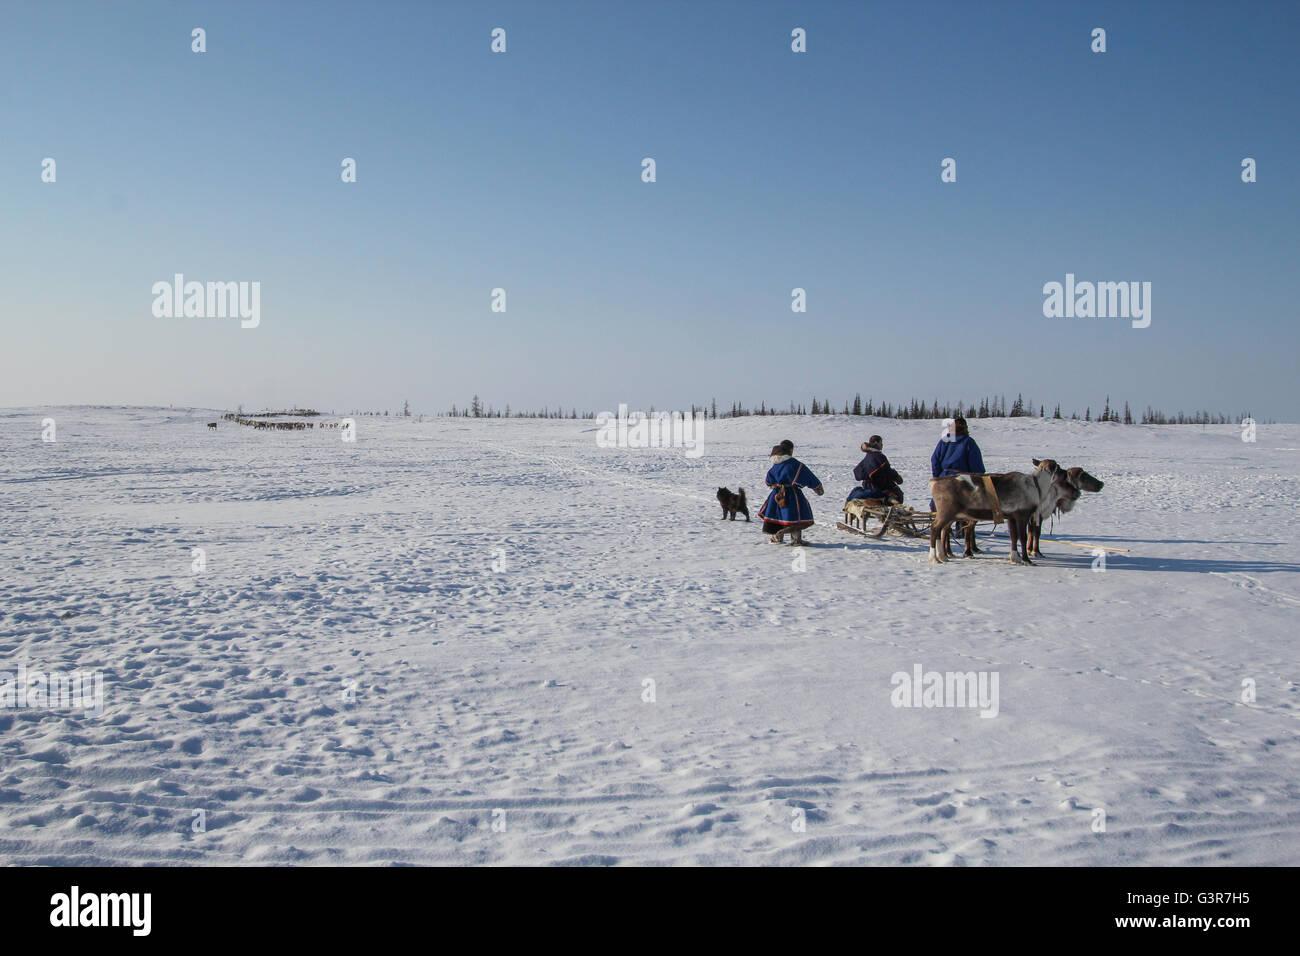 Nenets reindeer herders wander to place new settlements. The Yamal Peninsula. - Stock Image